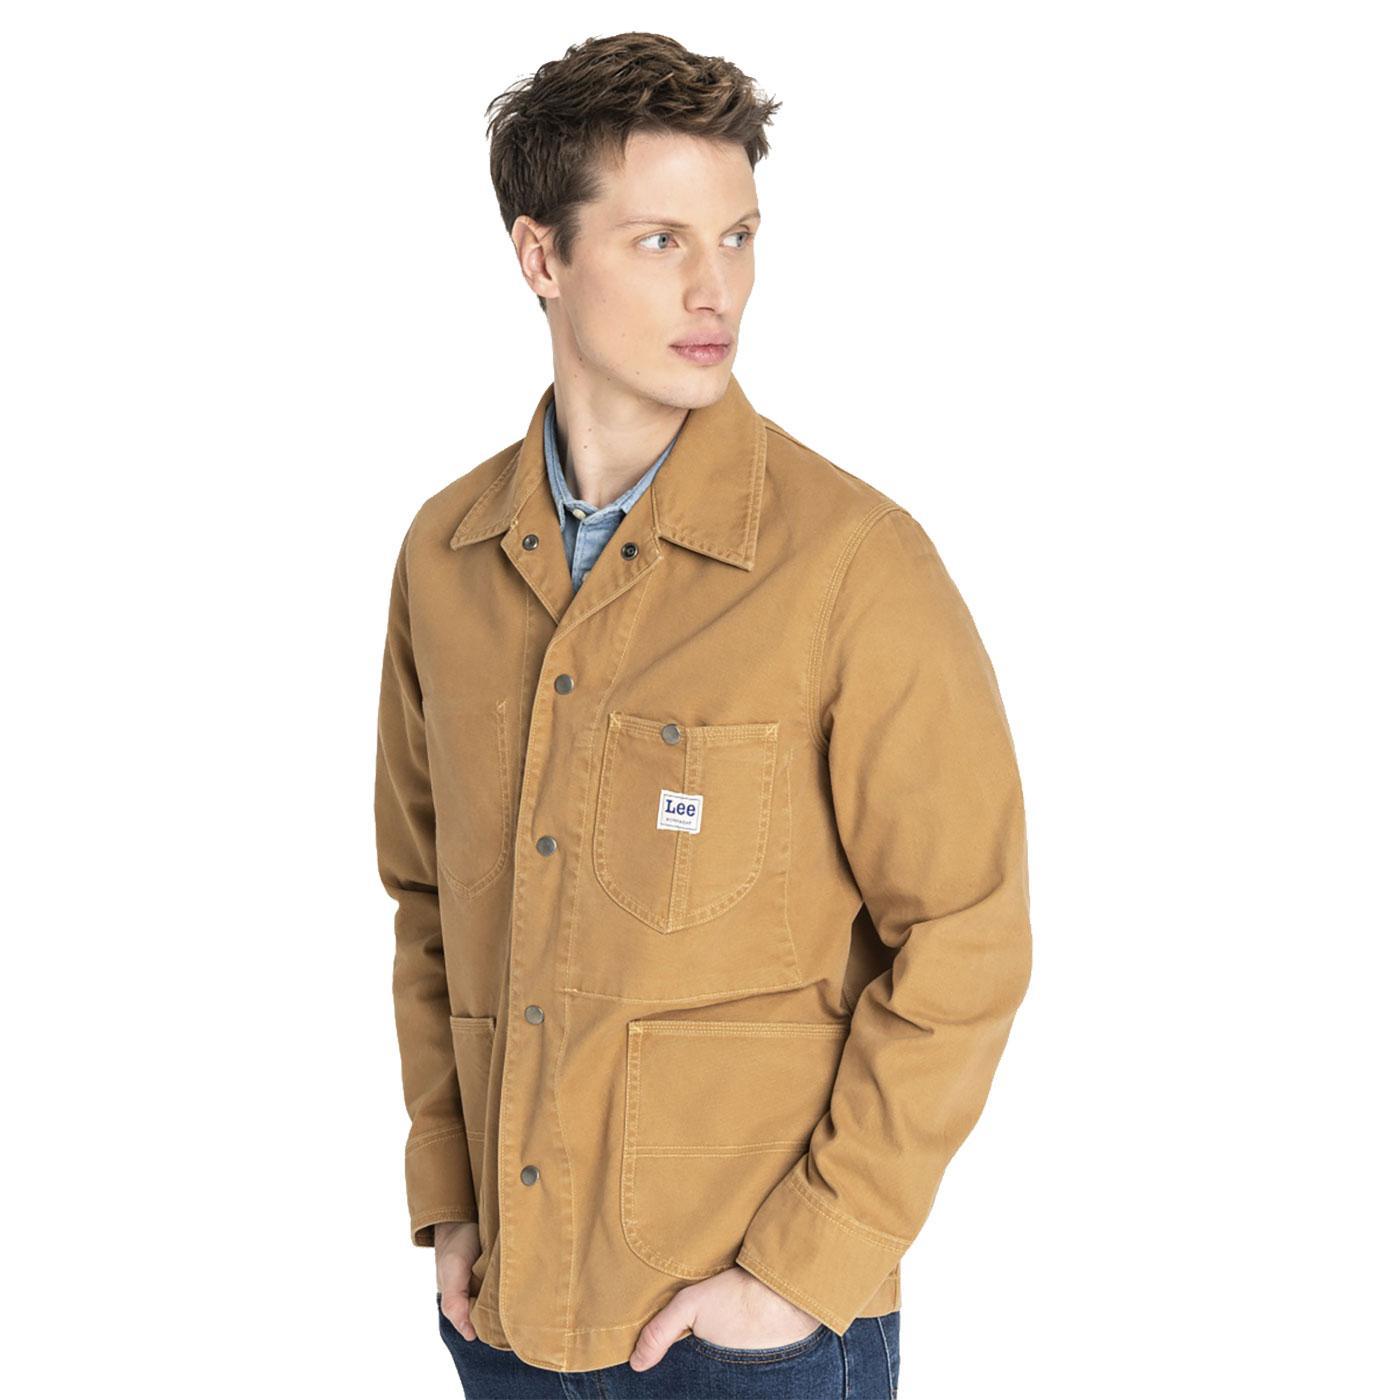 LEE JEANSRetro Loco Workwear 60's Western Jacket